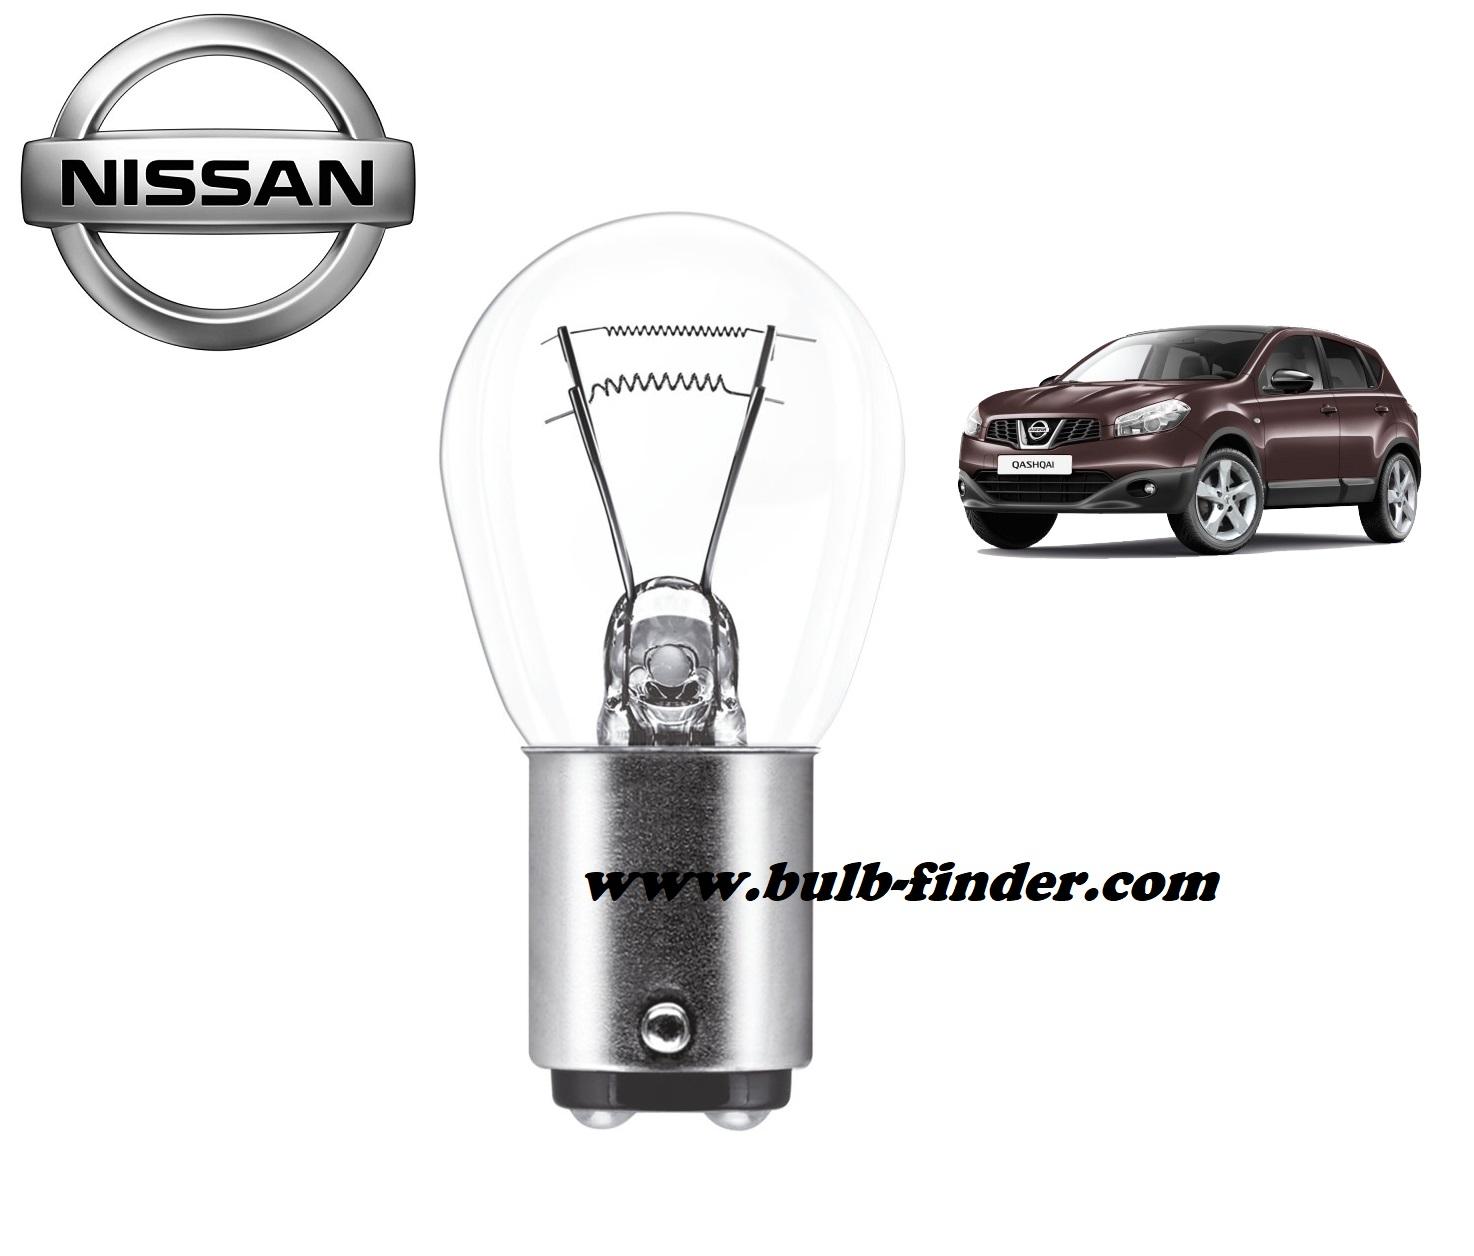 Nissan Qashqai bulb model TAIL LIGHT